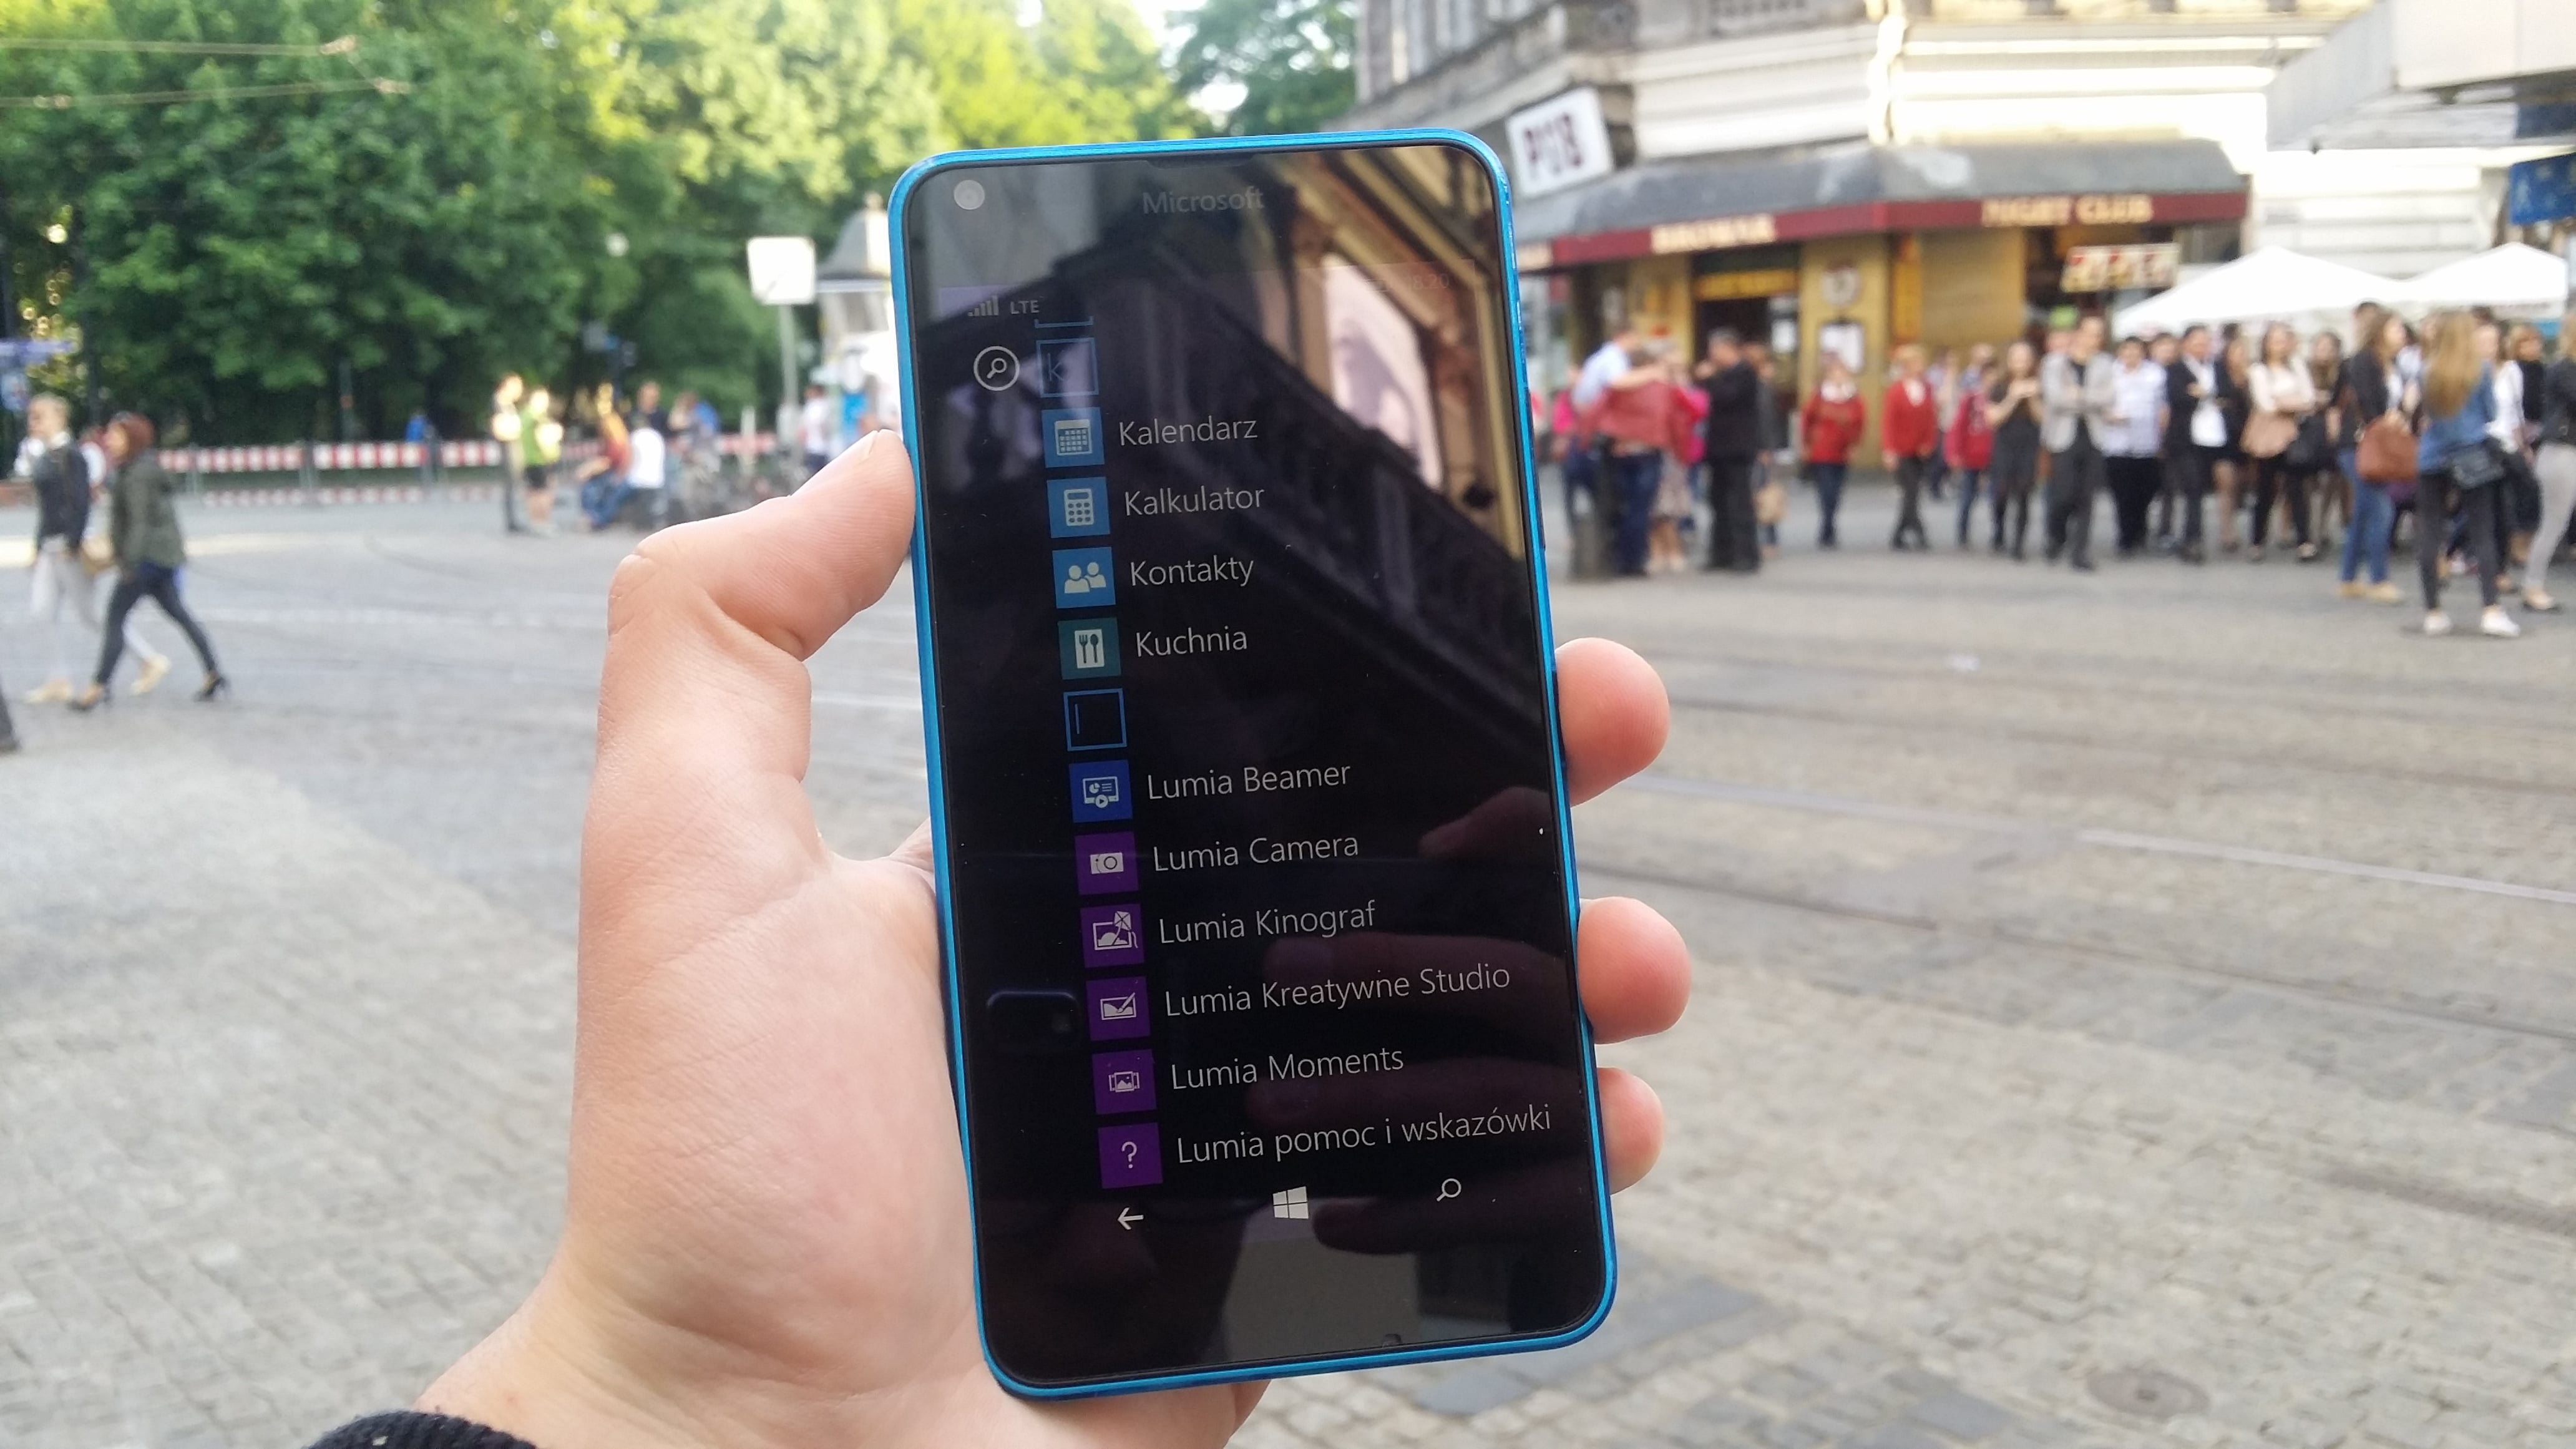 Windows 10 Mobile powoli trafia na pokład Microsoft Lumia 640 LTE